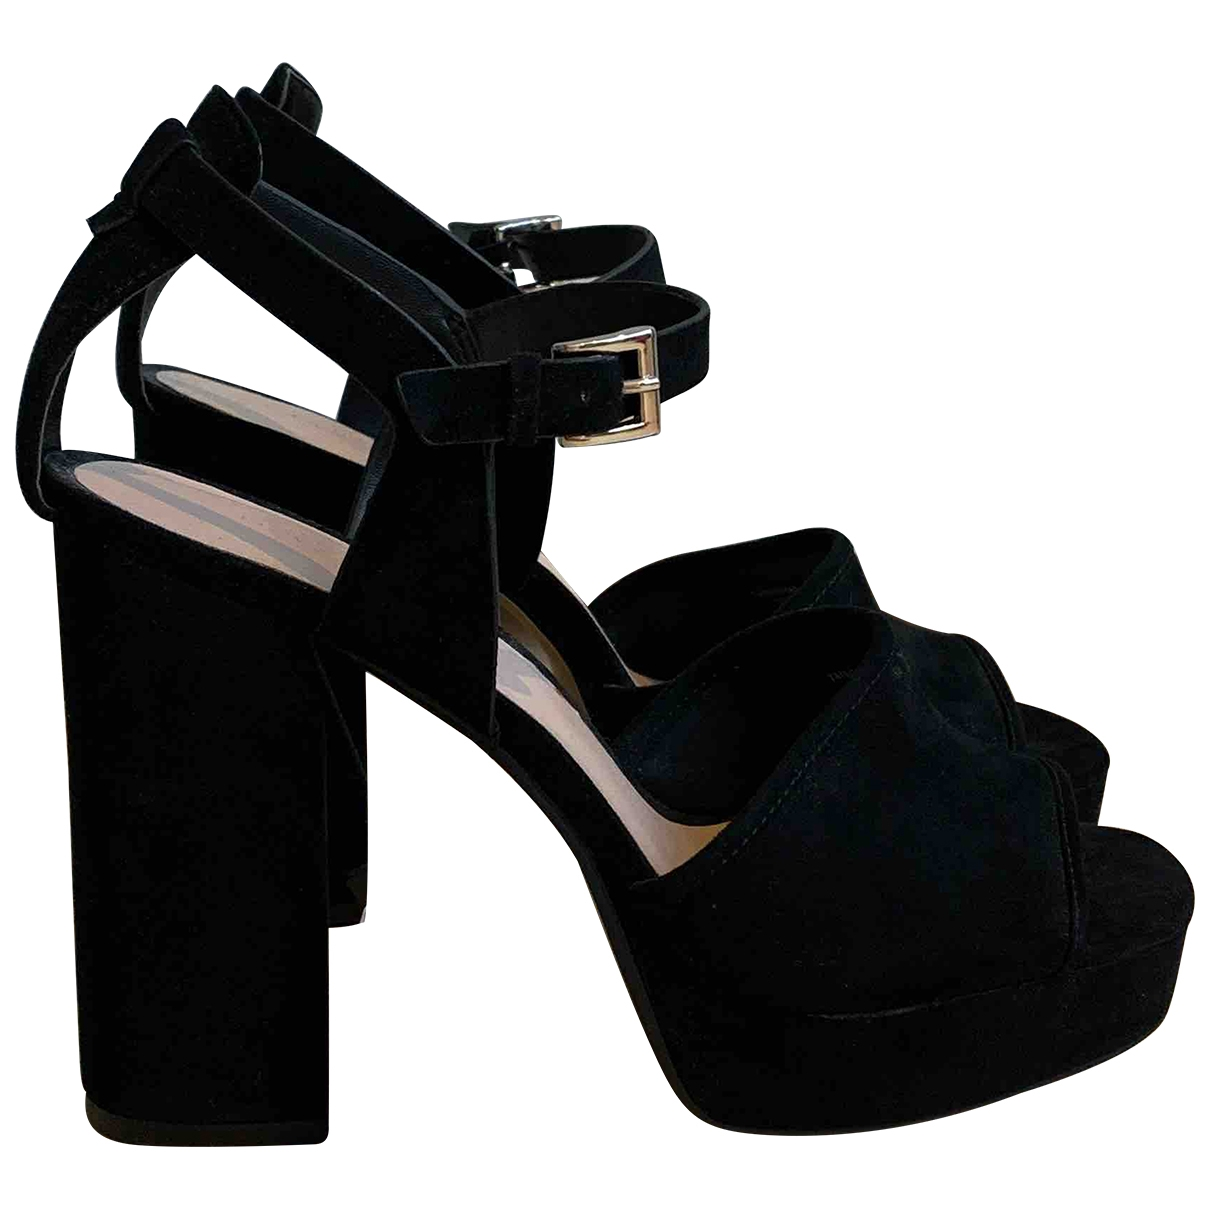 Zara \N Black Suede Heels for Women 41 EU